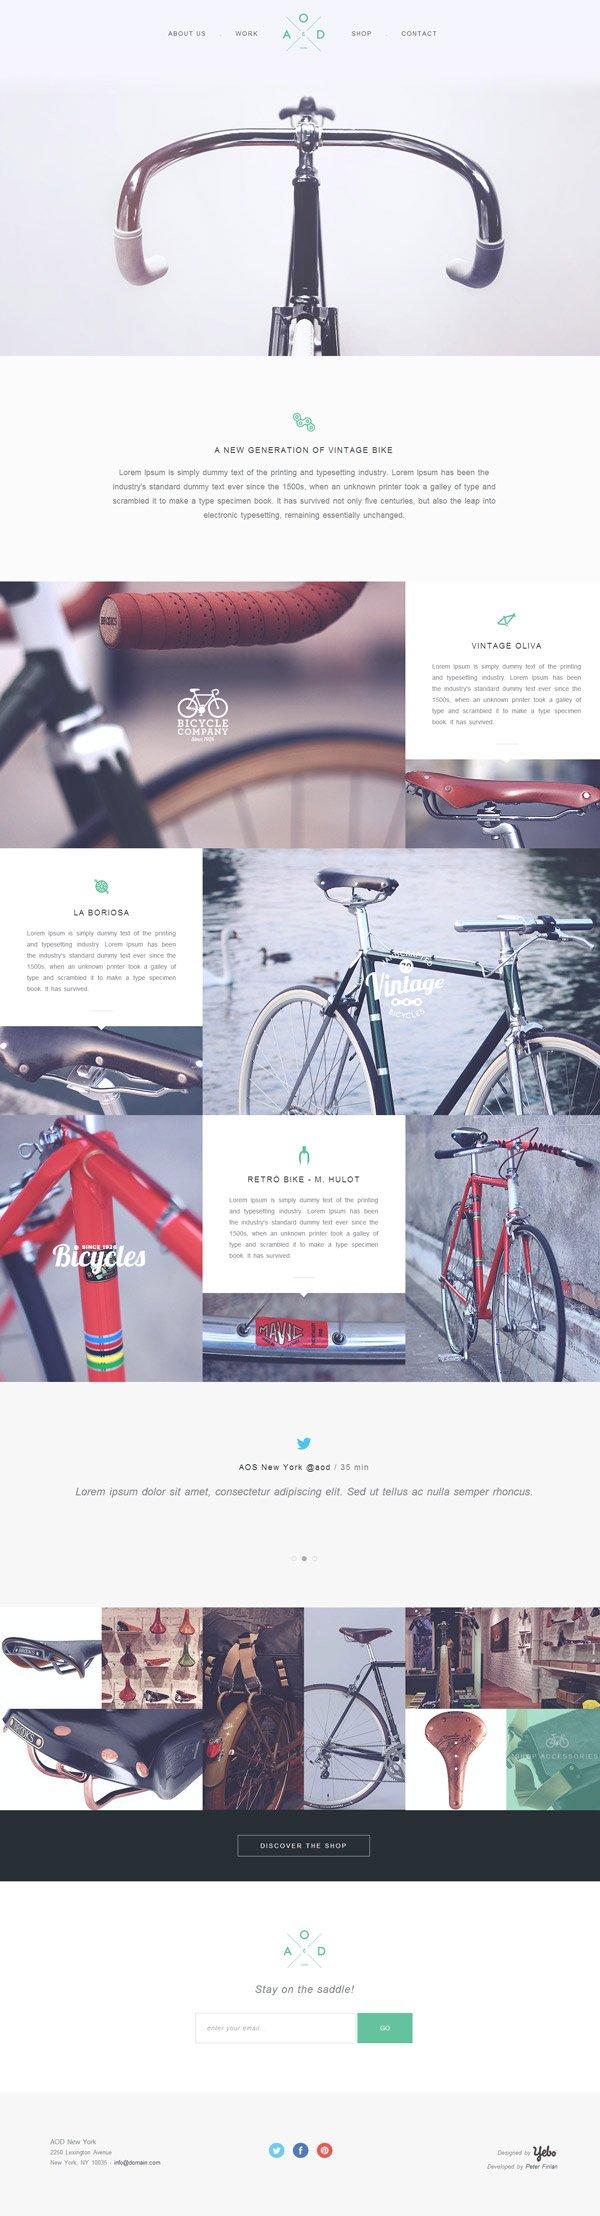 Yebo Bicycle шаблон сайта (HTML5/CSS3) скачать бесплатно